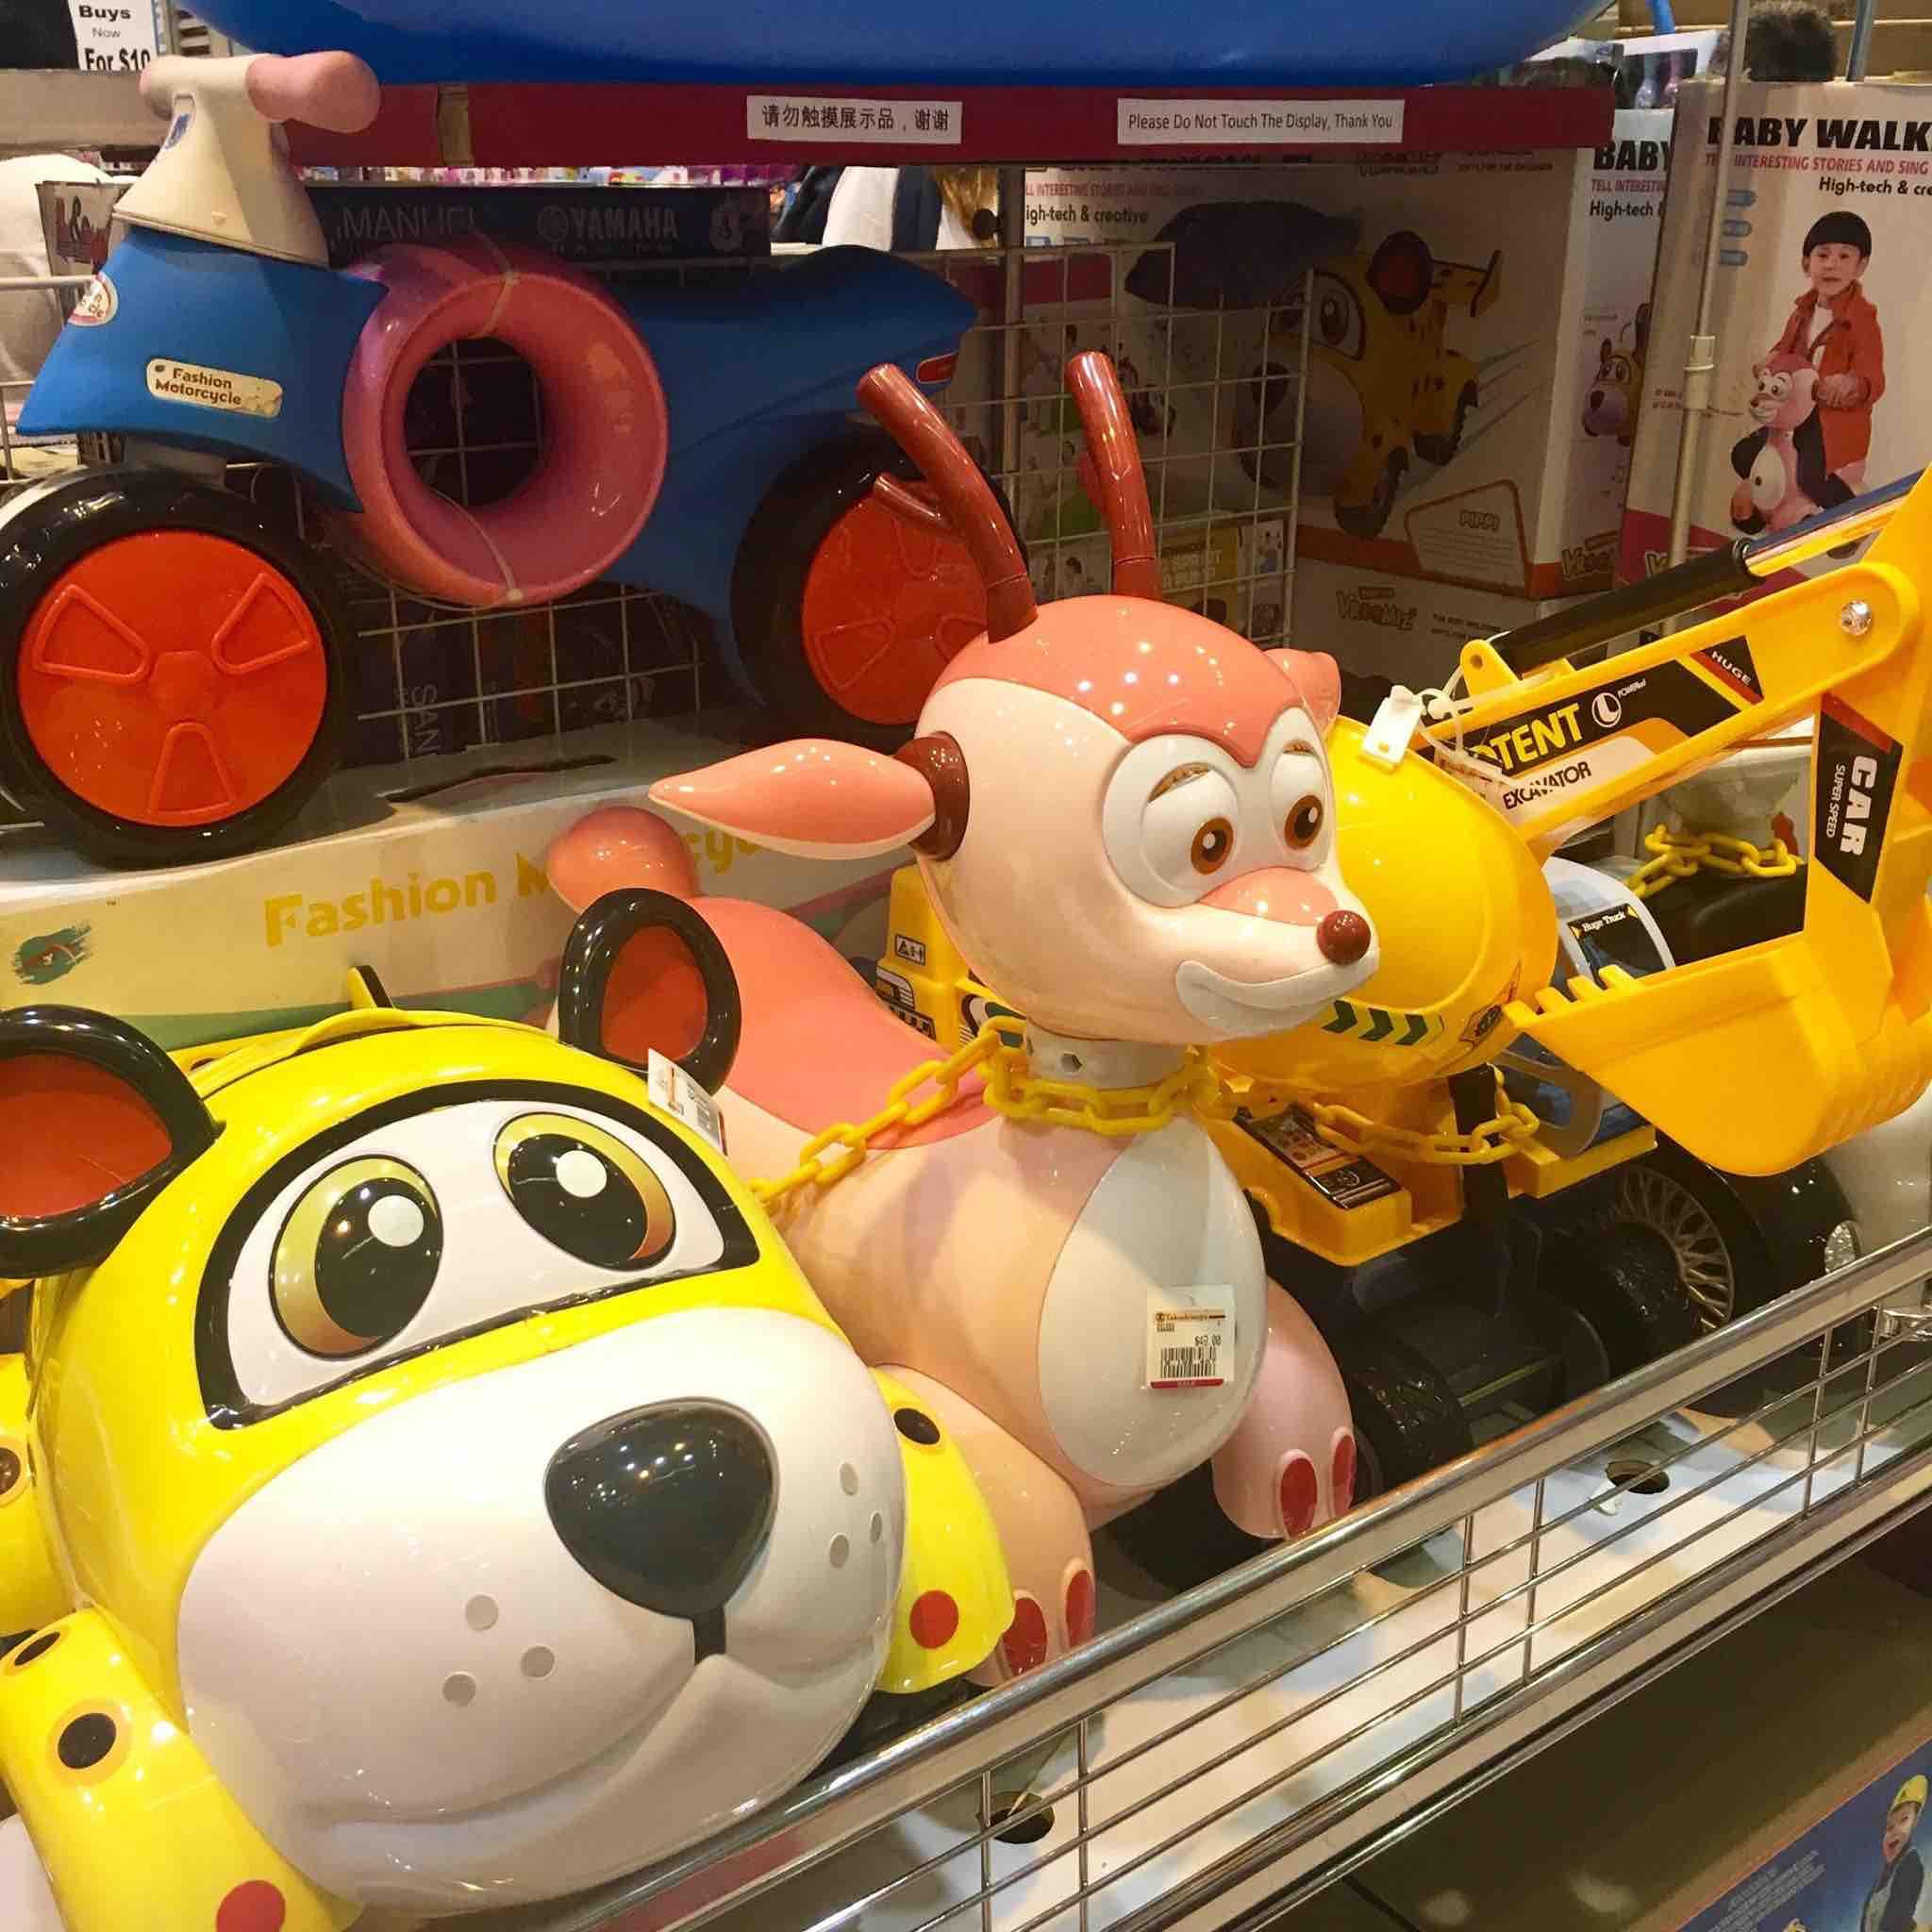 Takashimaya Singapore 21st Craziest Toys Sale Promotion 28 Jul - 6 Aug 2017   Why Not Deals 10 & Promotions